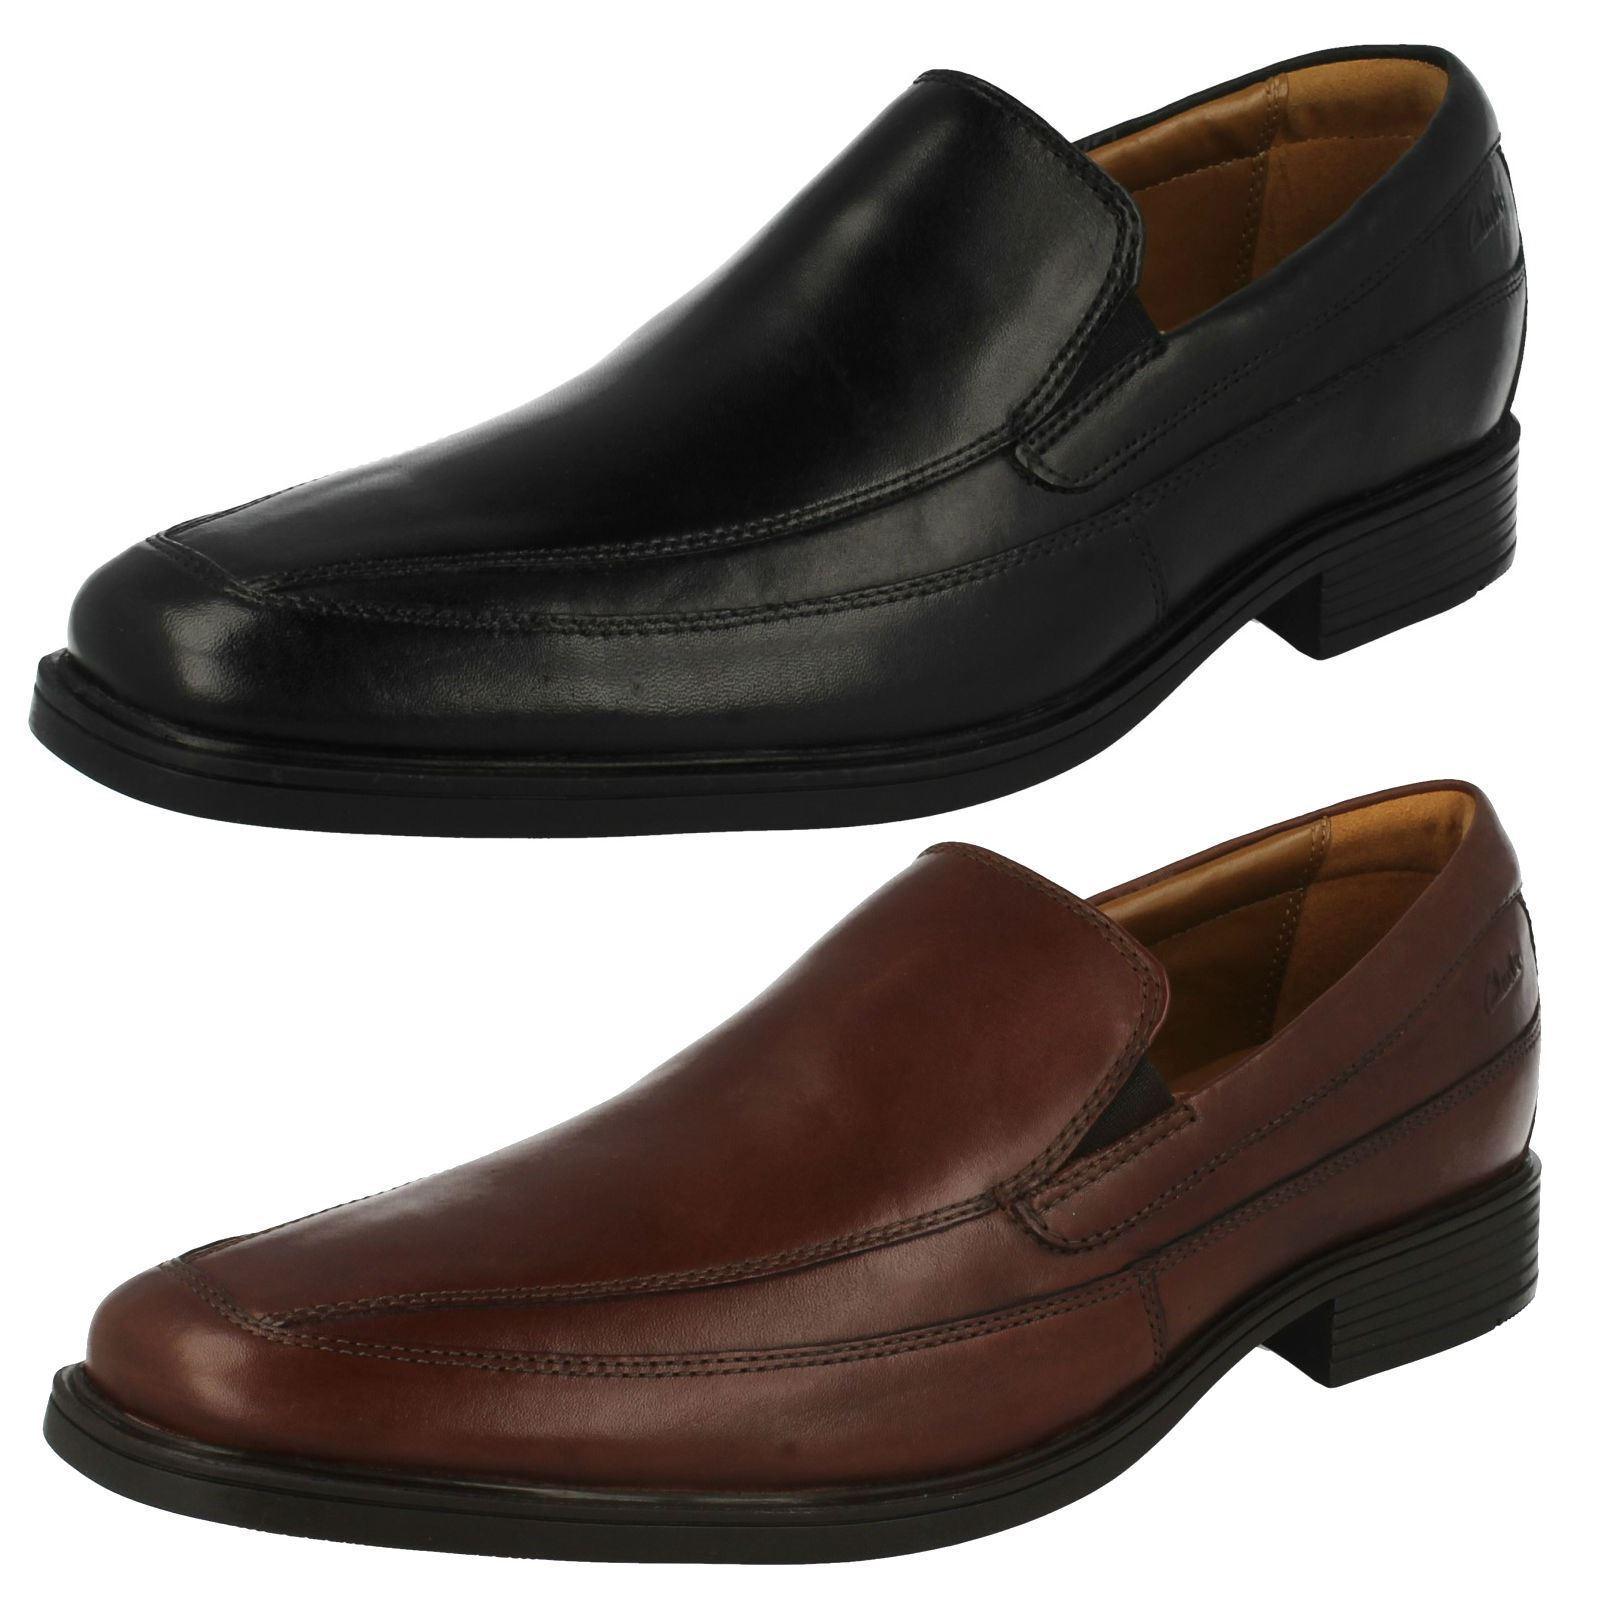 Clarks Mens Formal Slip On Shoes Tilden Free